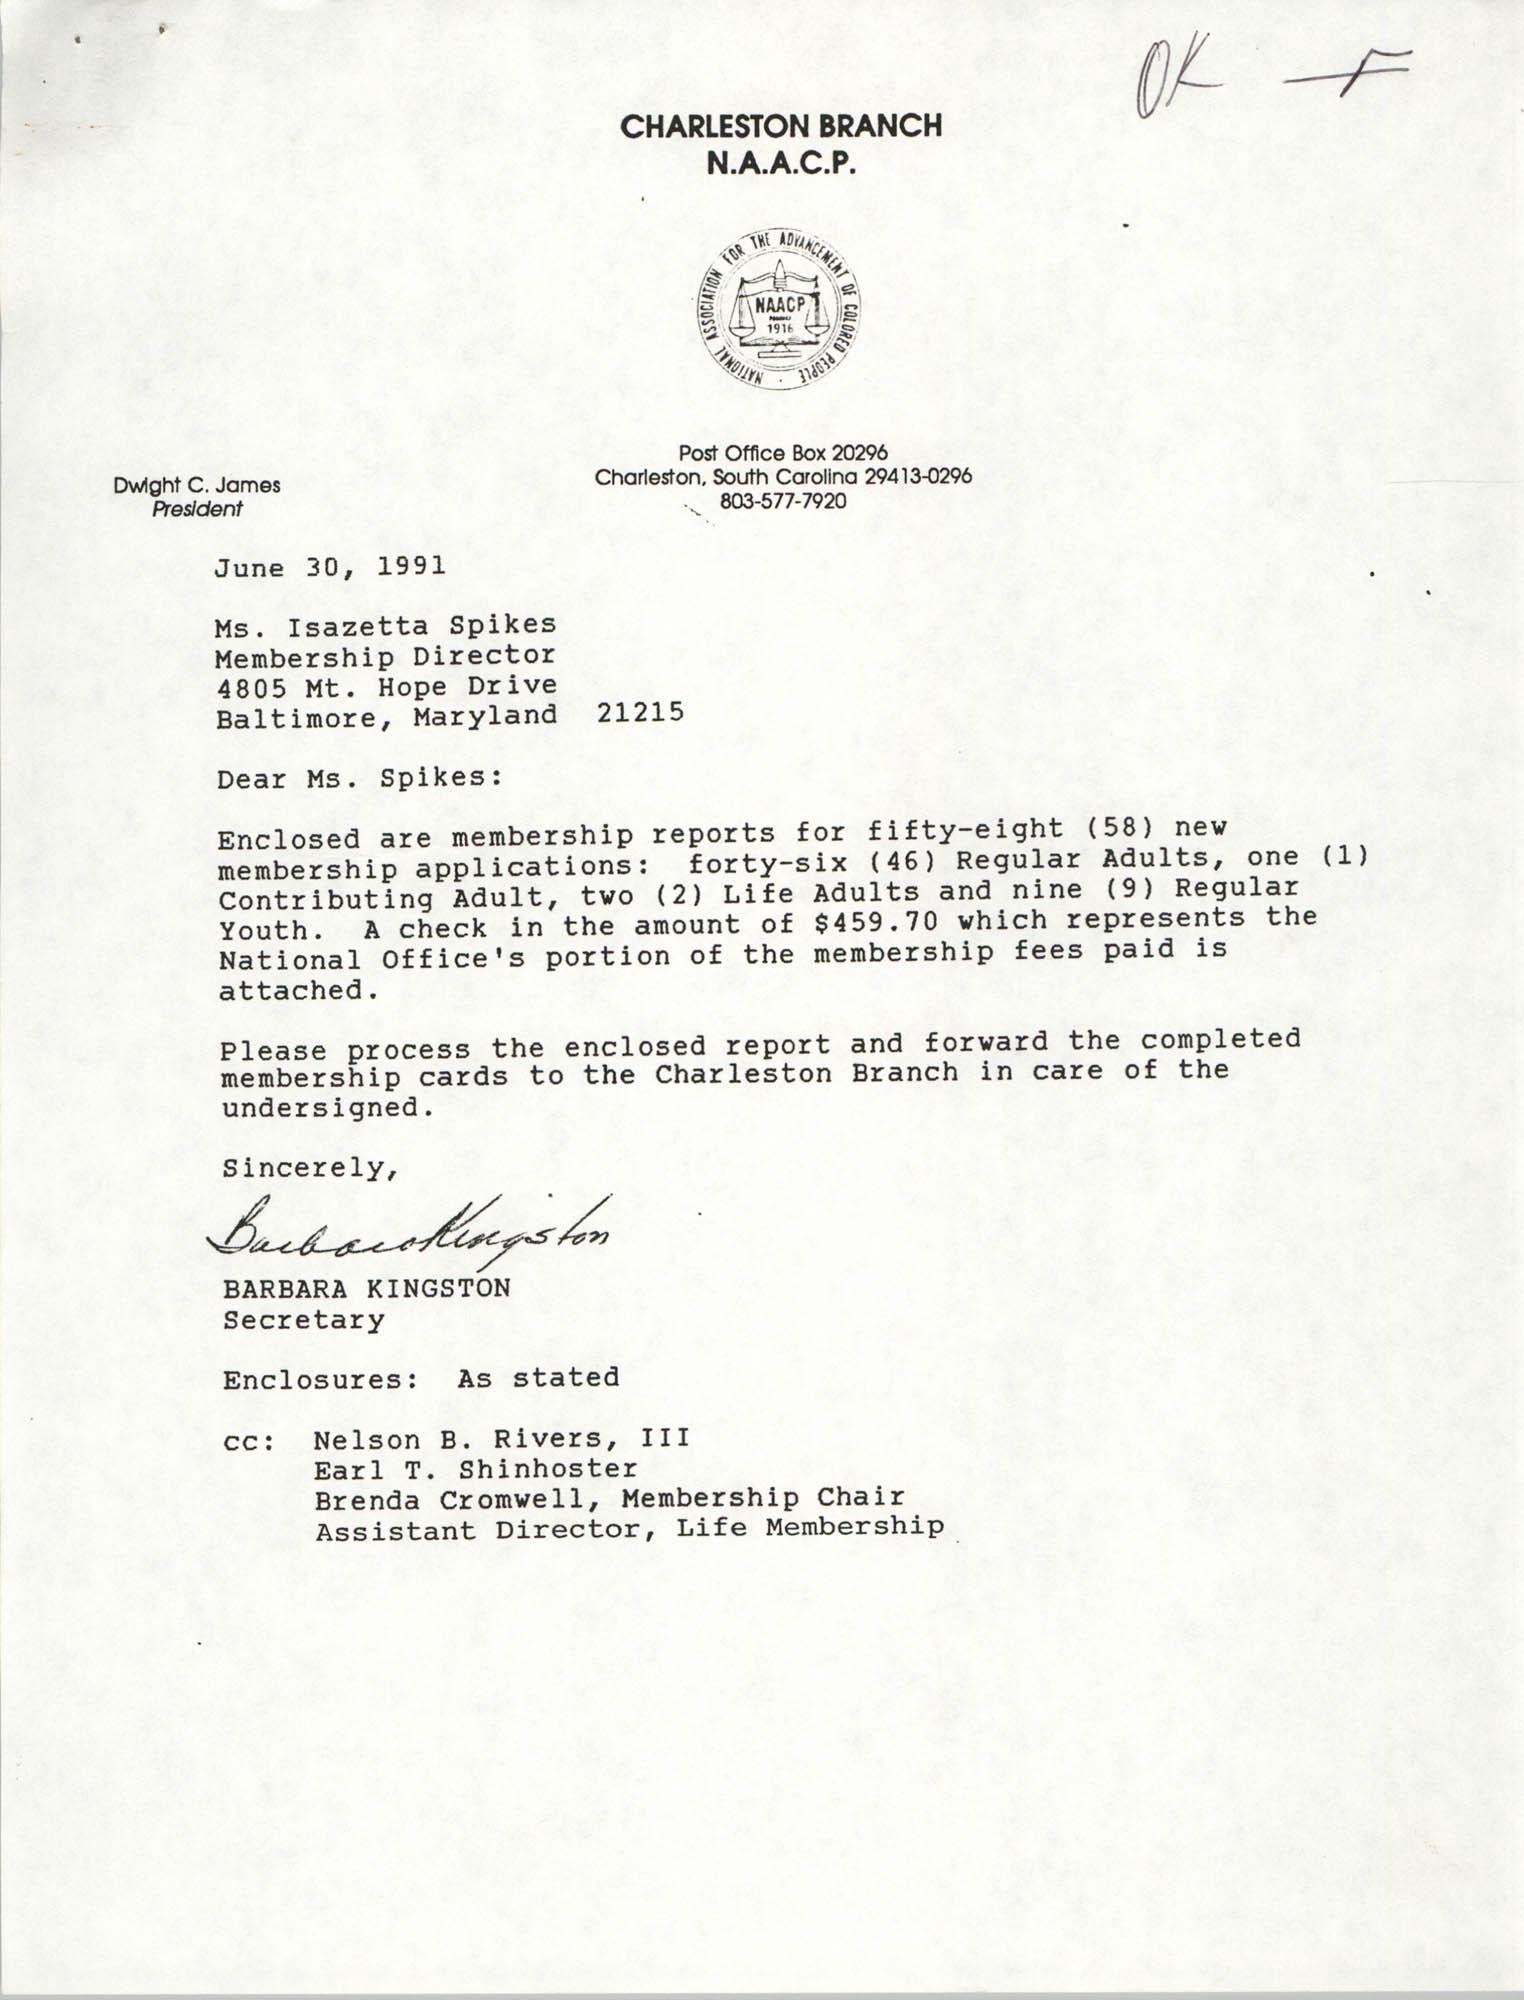 Letter from Barbara Kingston to Isazetta Spikes, June 30, 1991